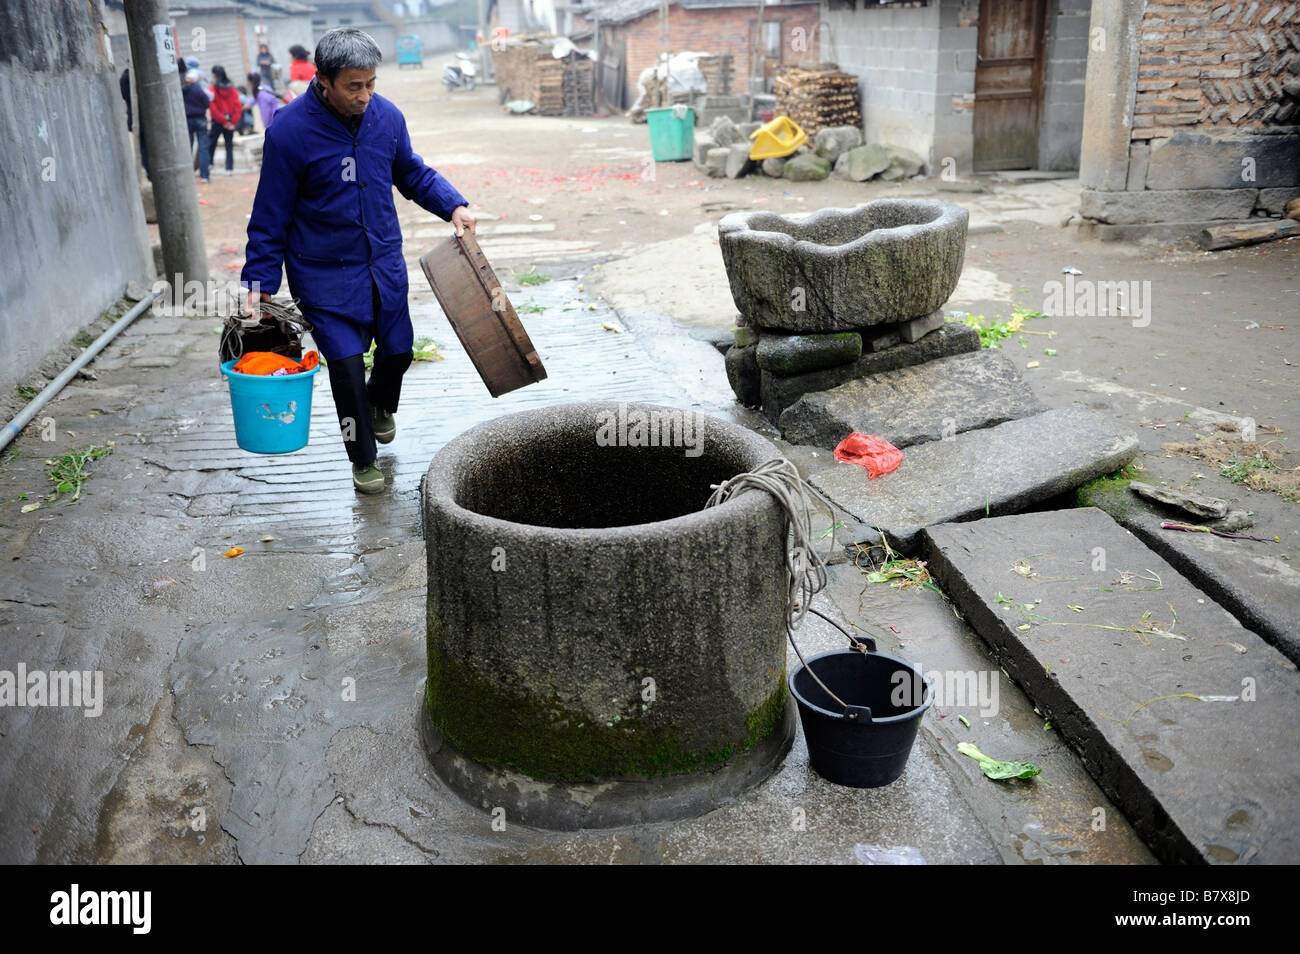 Alten Wasser dient auch noch in Tianbao Dorf, Yifeng, Jiangxi, China. 2. Februar 2009 Stockbild